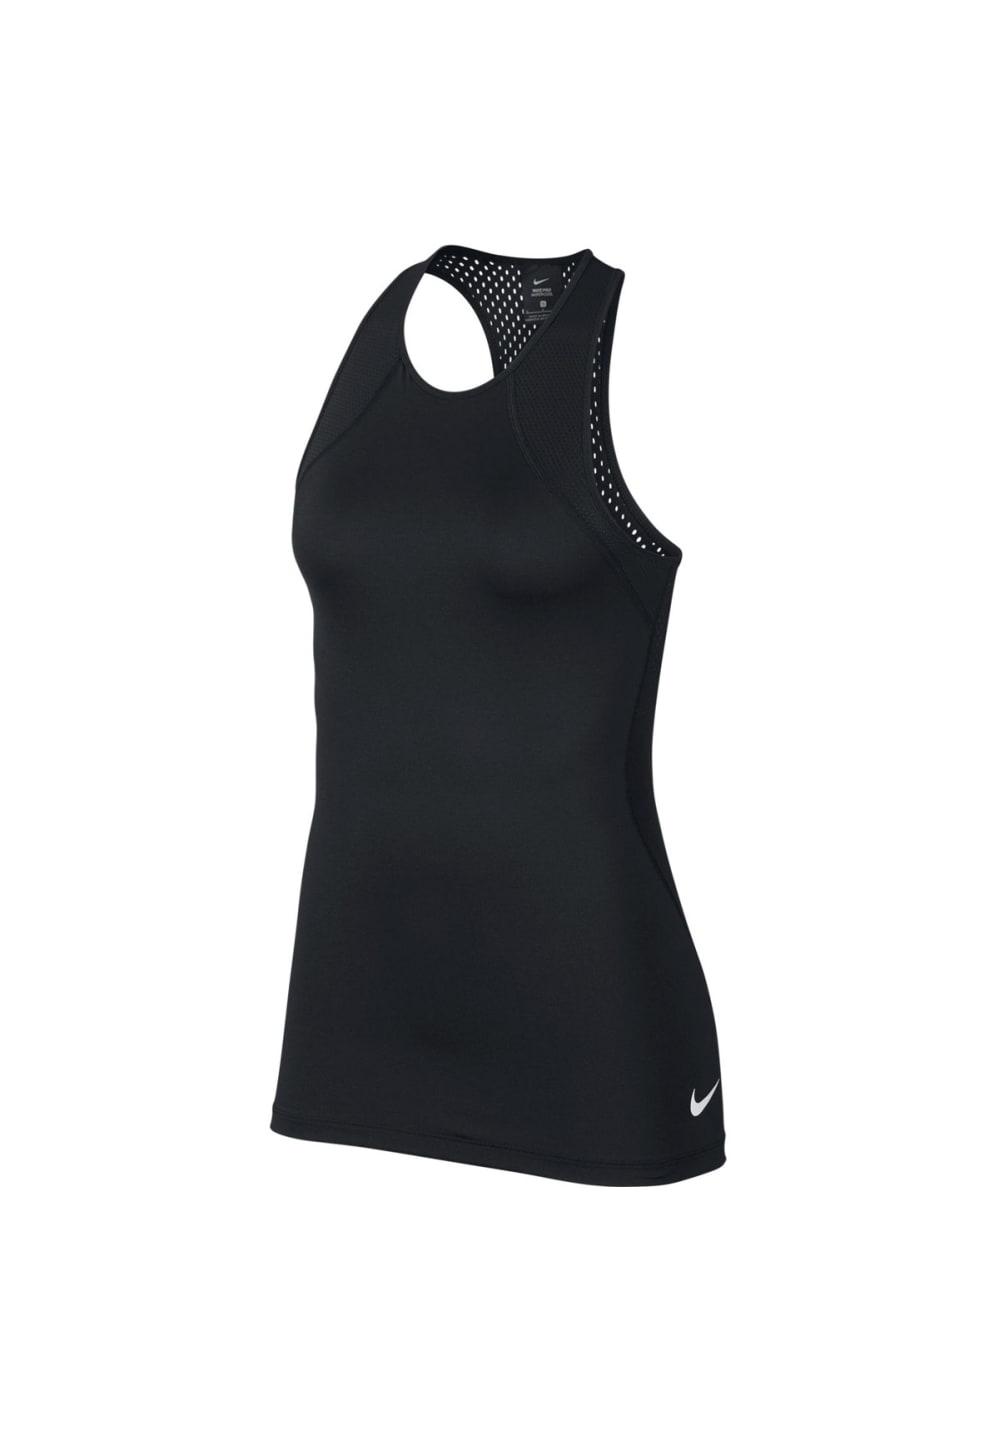 Nike Pro Hypercool Tank - Laufshirts für Damen - Schwarz, Gr. L